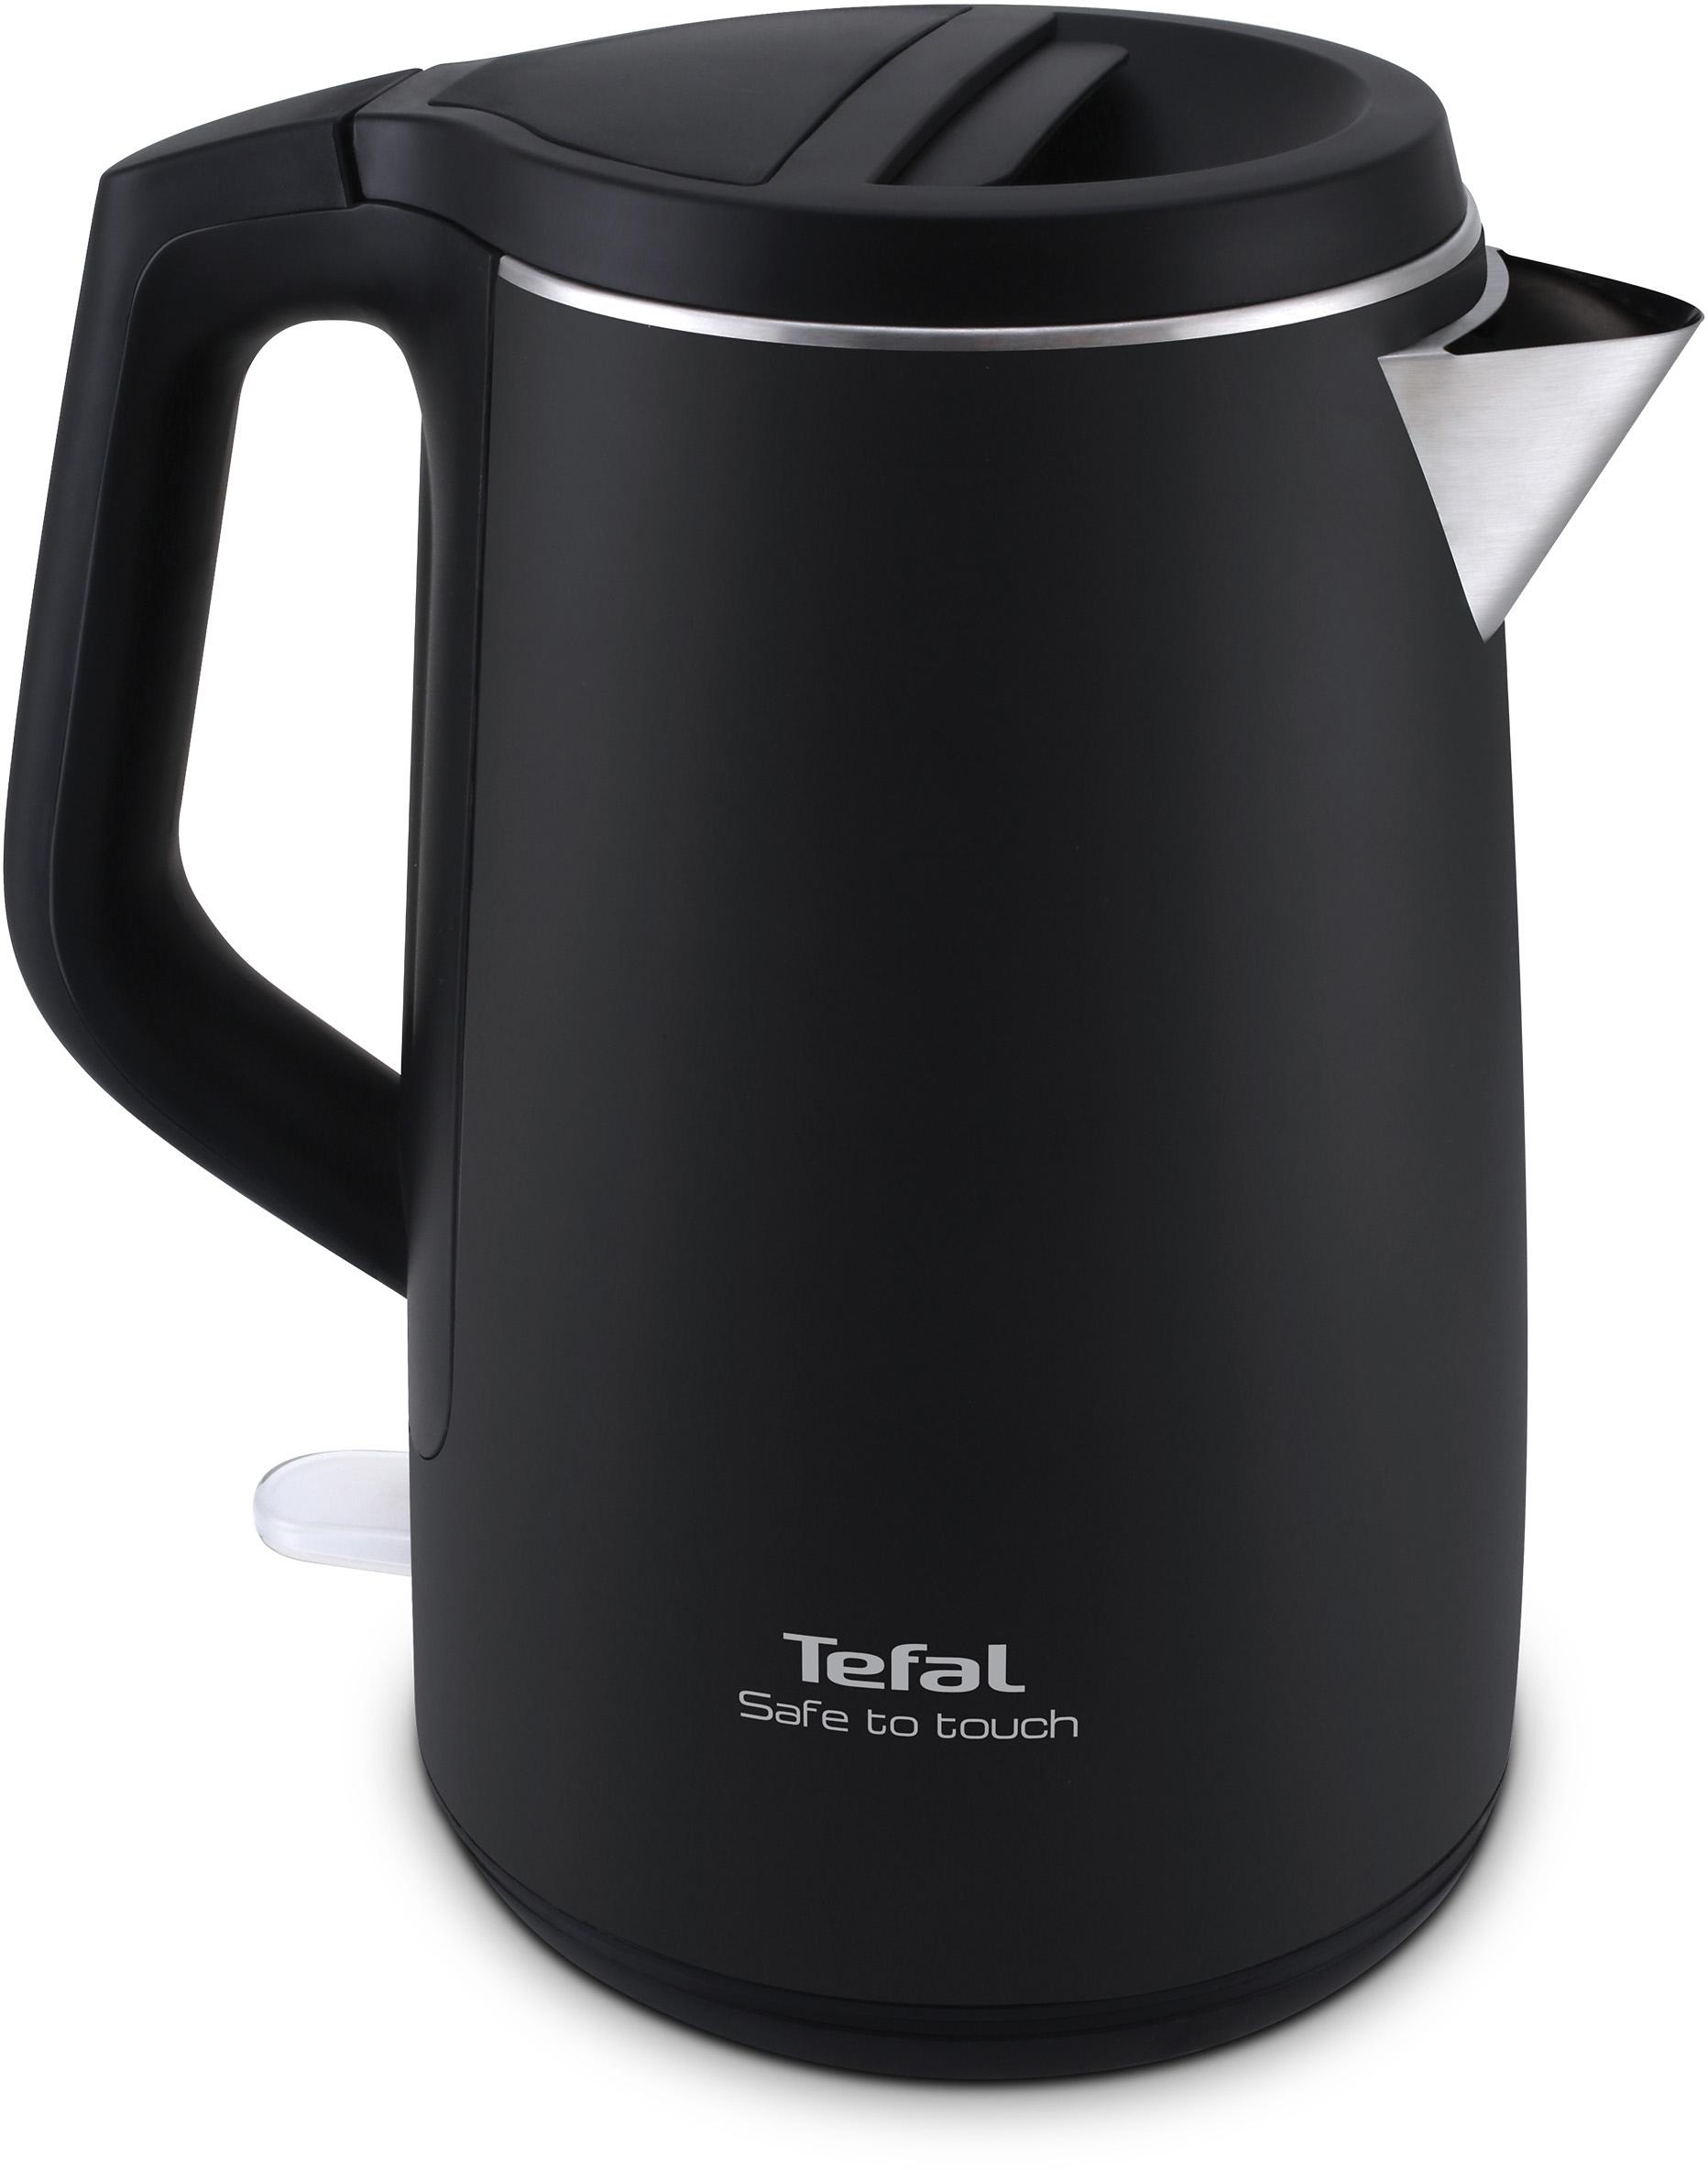 Tefal Waterkoker KO3718, 1,5 l - verschillende betaalmethodes